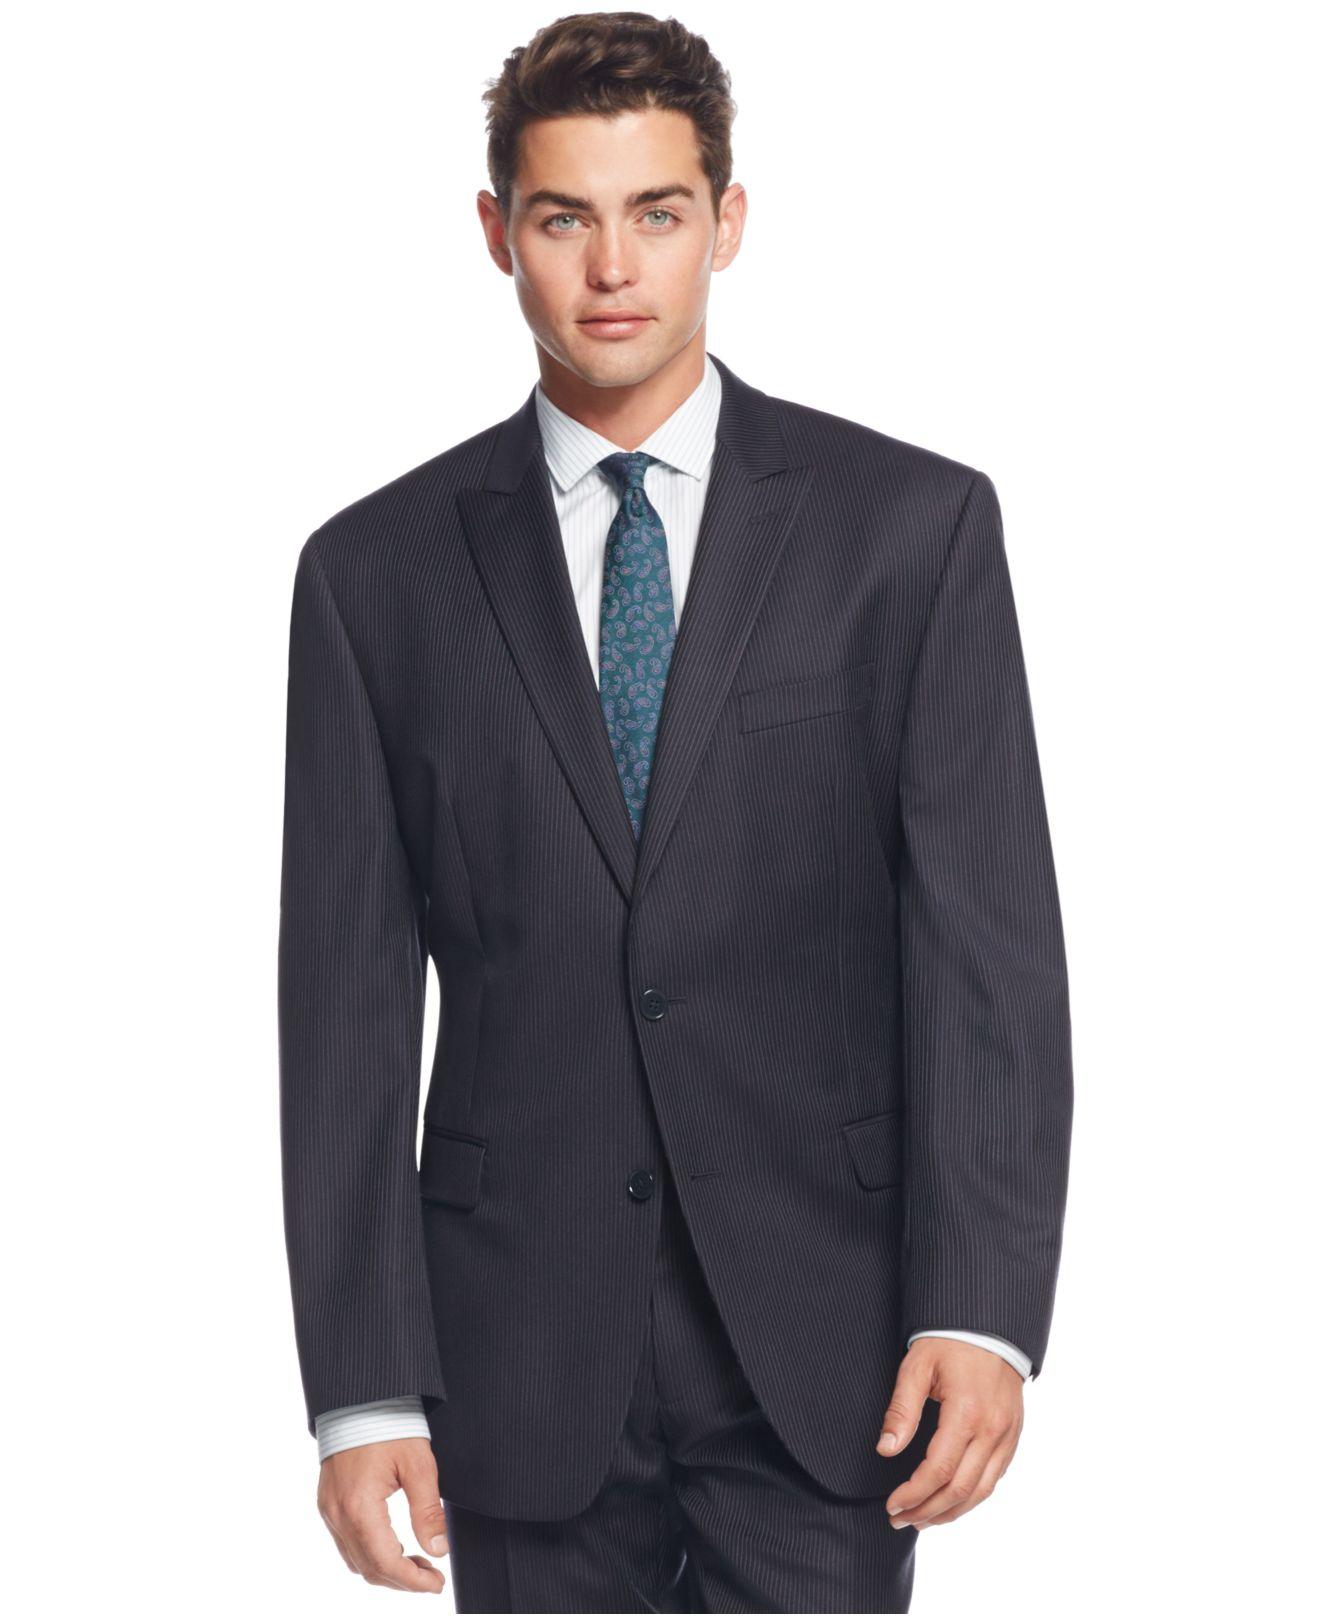 Calvin Klein Peak-Lapel Blazer Fashionable Online Big Sale For Sale Cheap Pay With Visa ik1zCq